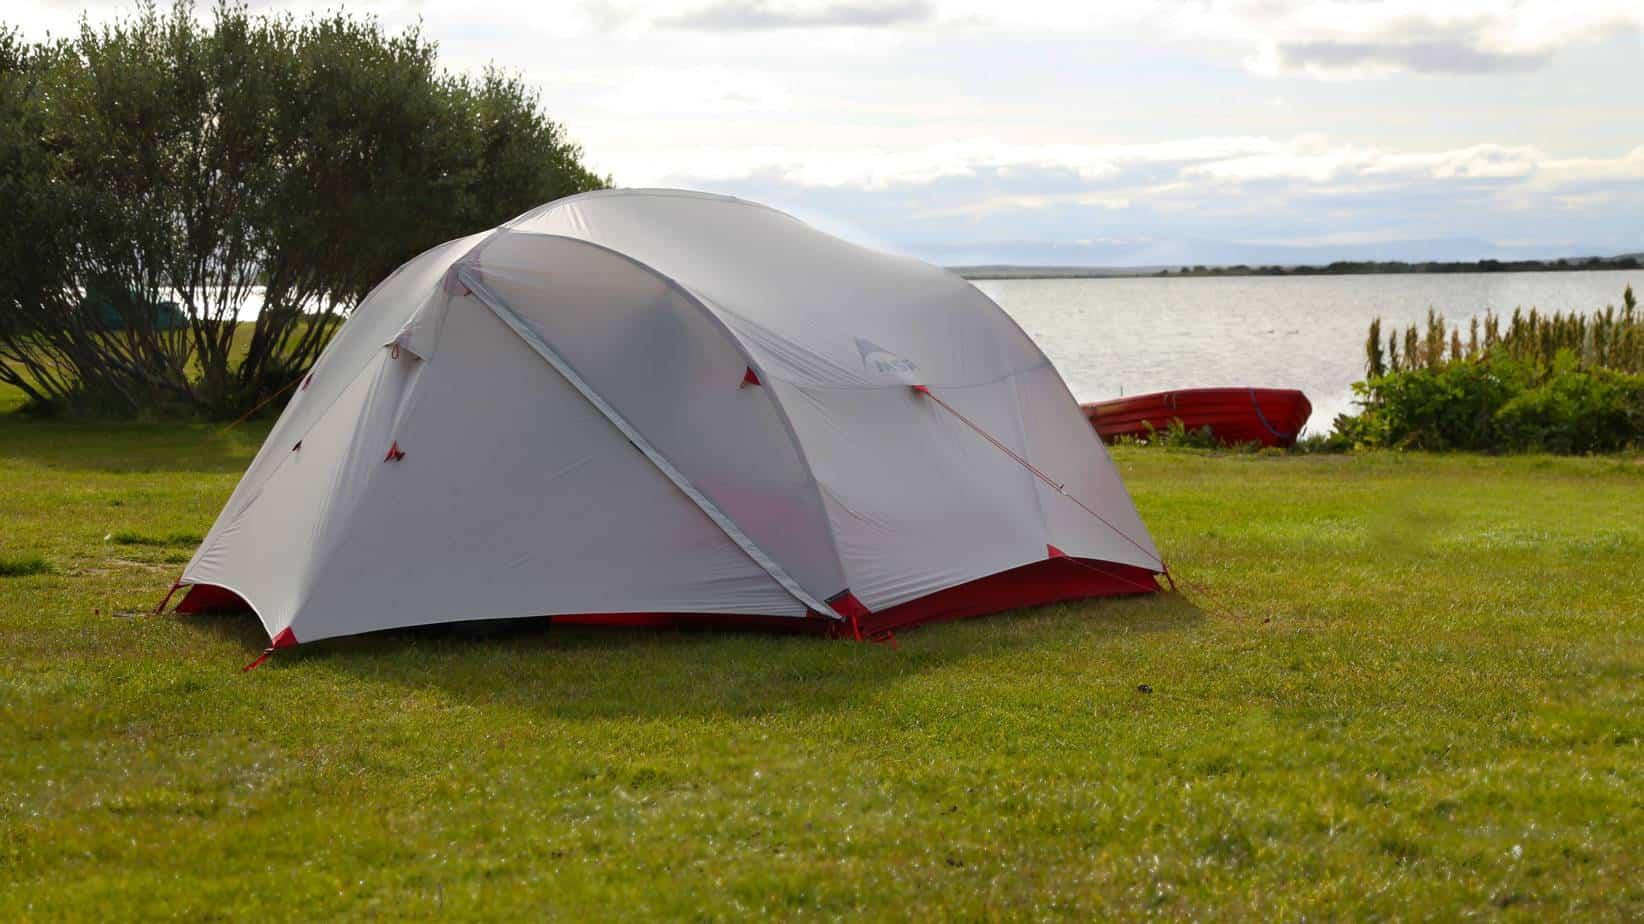 & Field Tested: MSR Mutha Hubba NX 3-Person Tent u2013 Expedition Portal